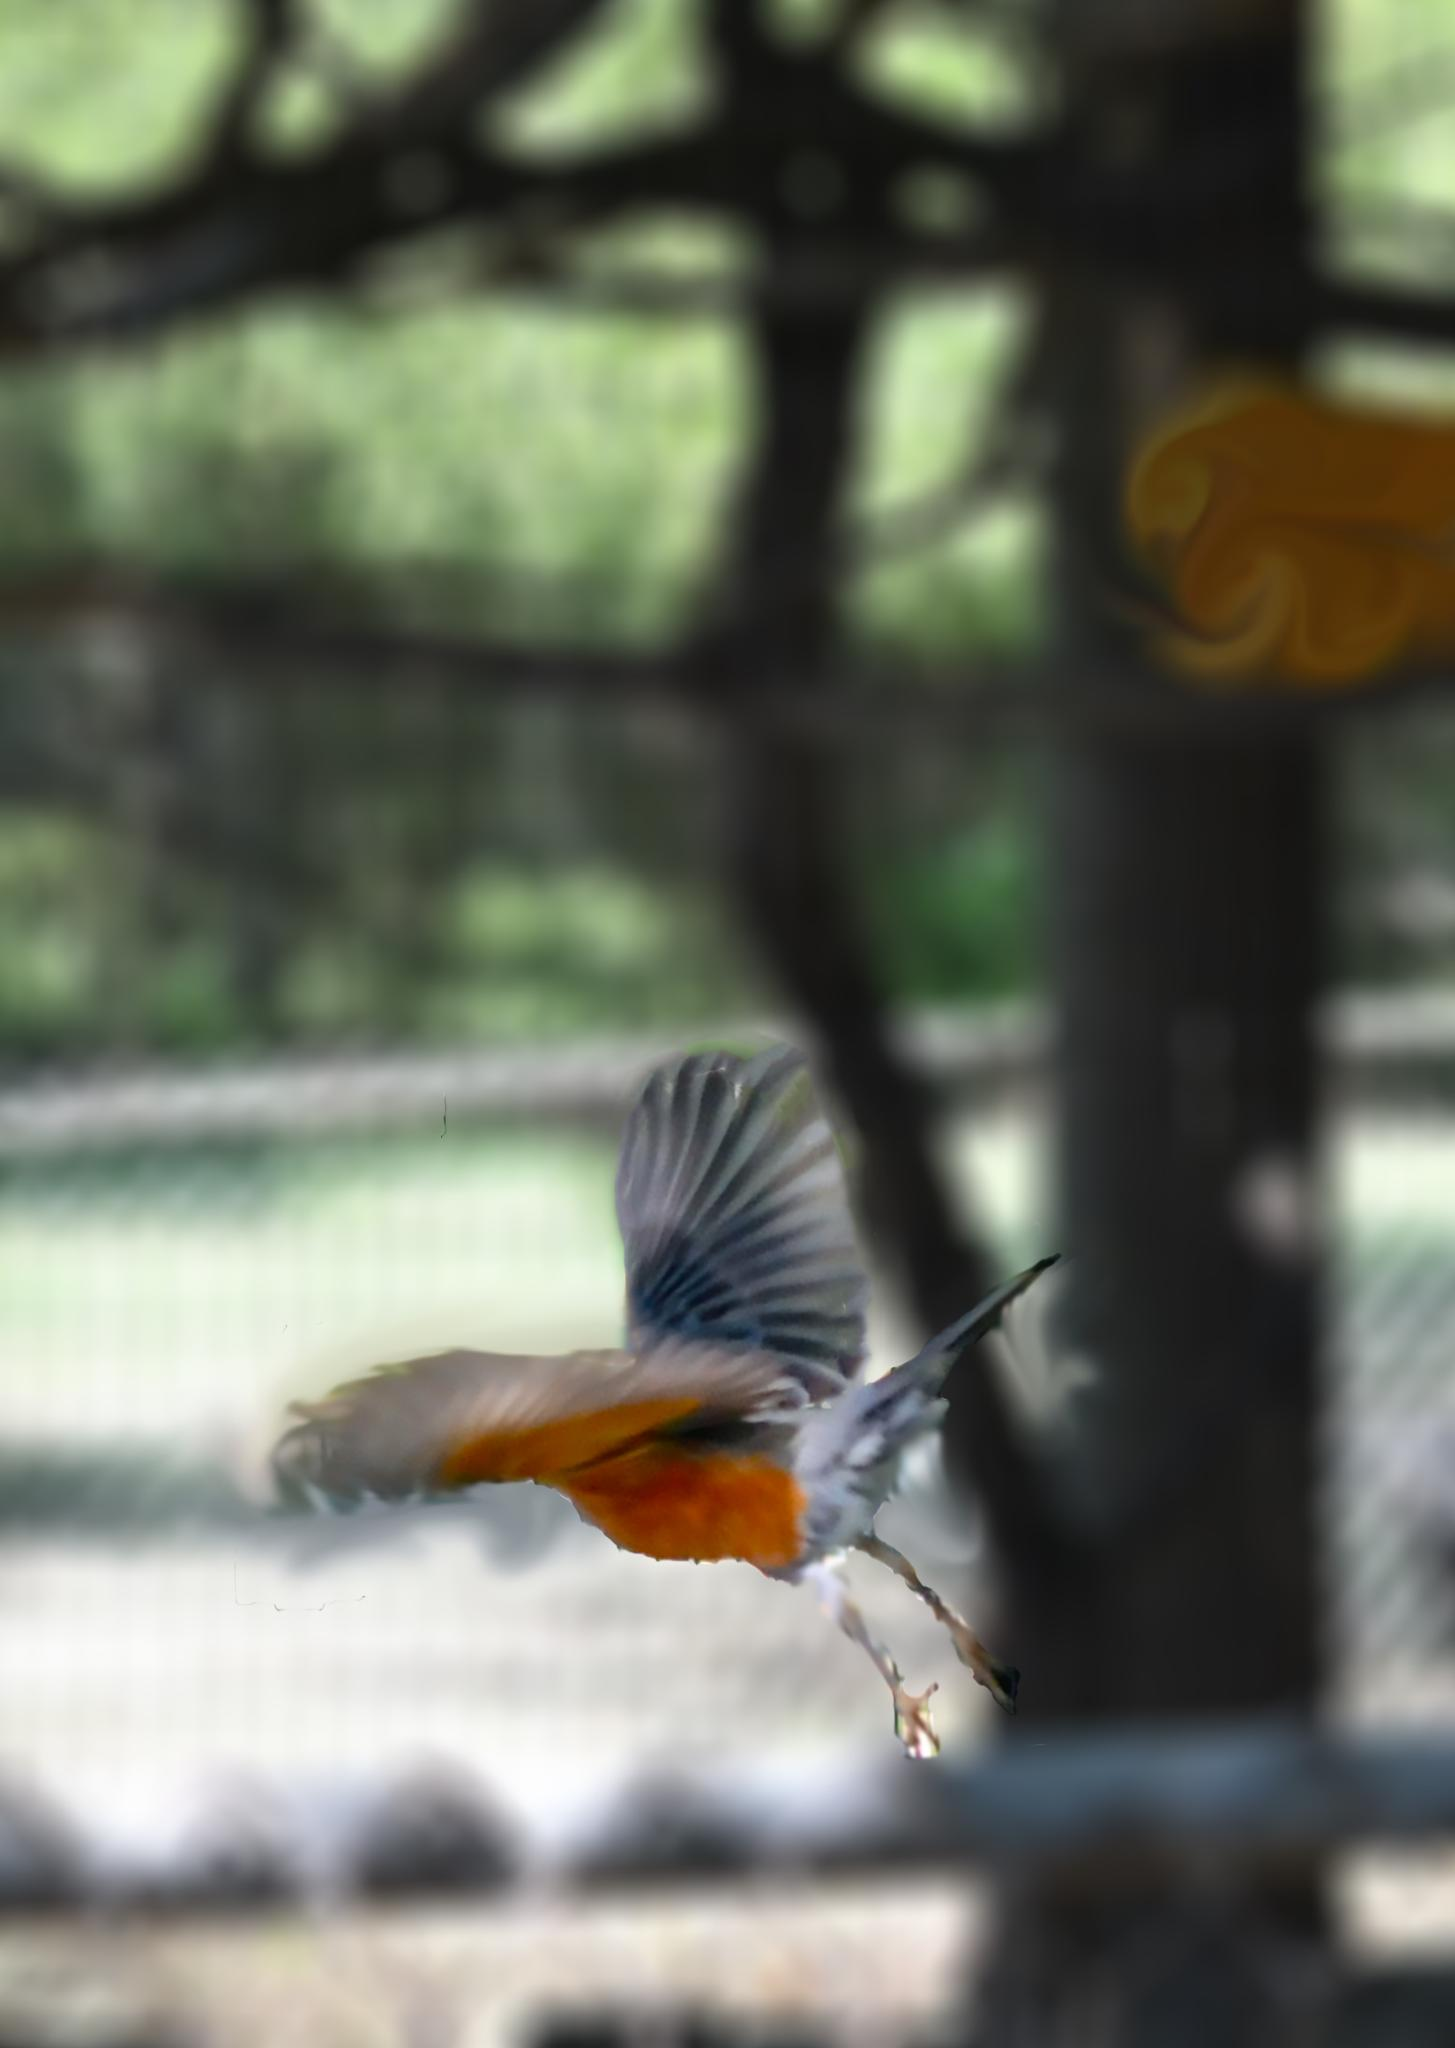 Robin in Flight by evelyn.vinson